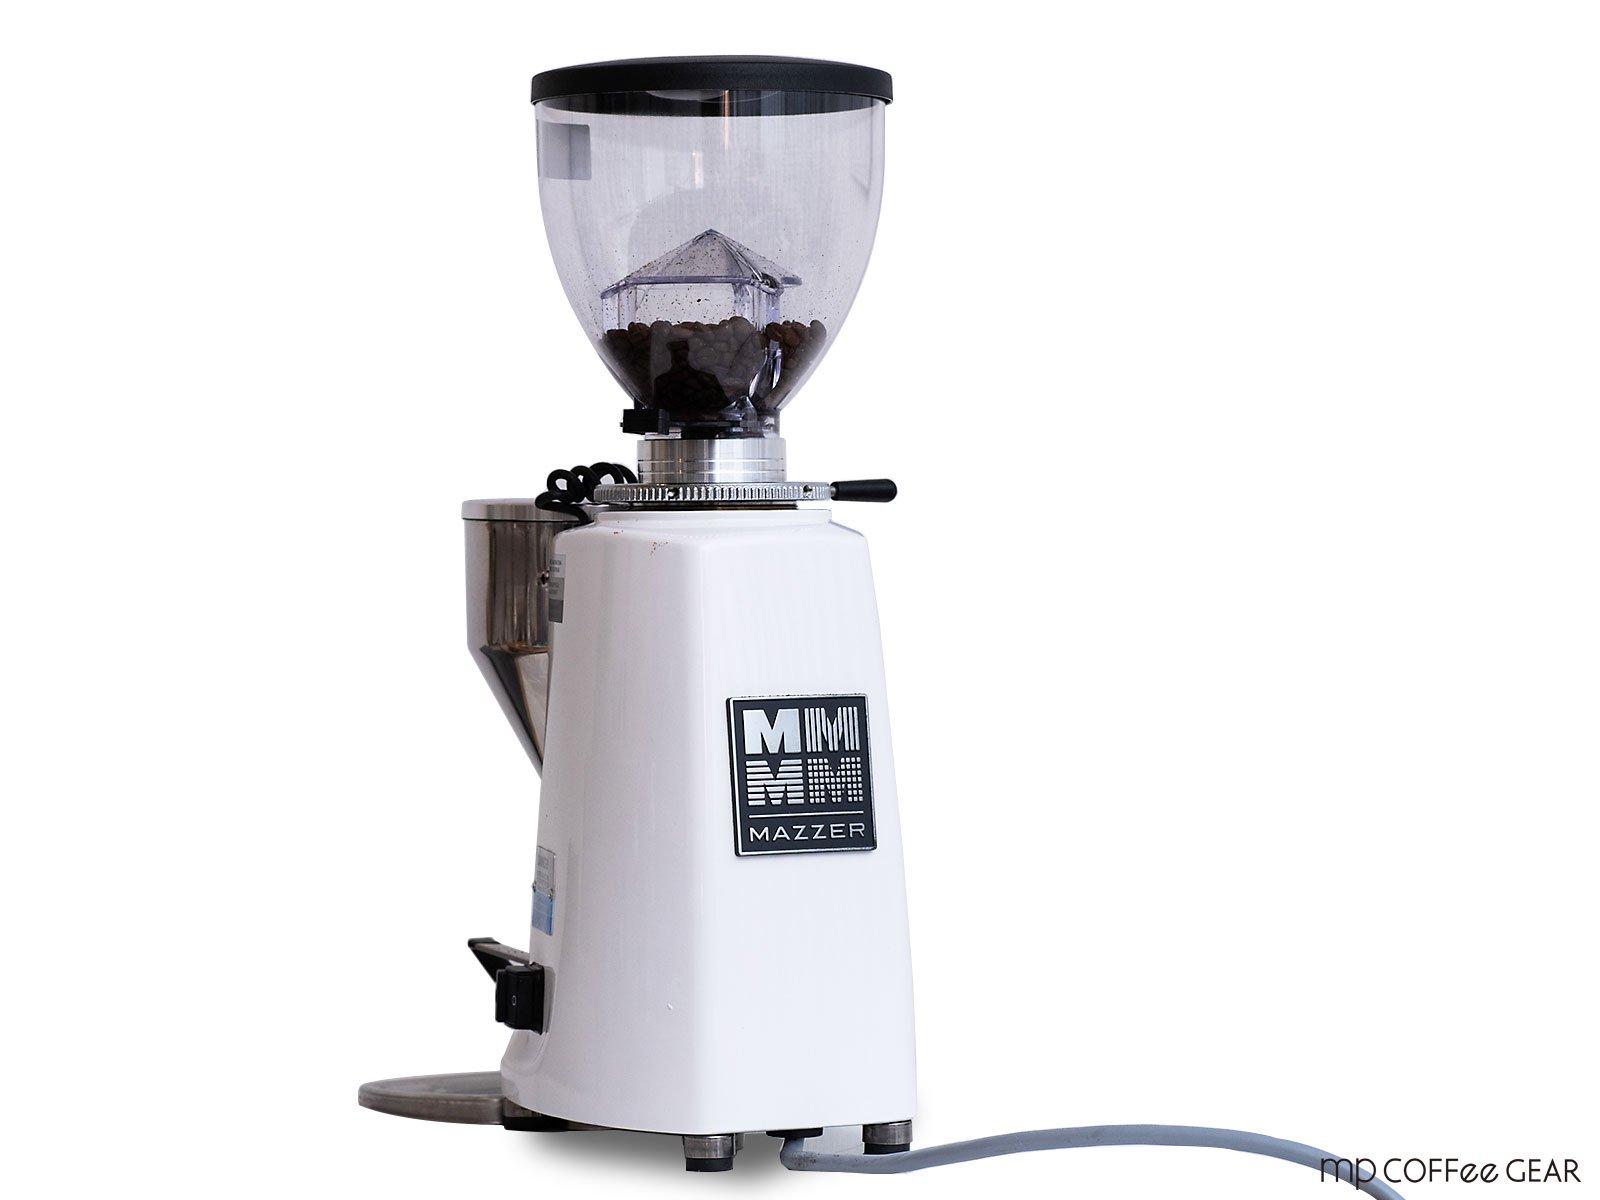 MAZZER(マッツァ)グラインダー MINI - ELECTRONIC(A) ホワイト